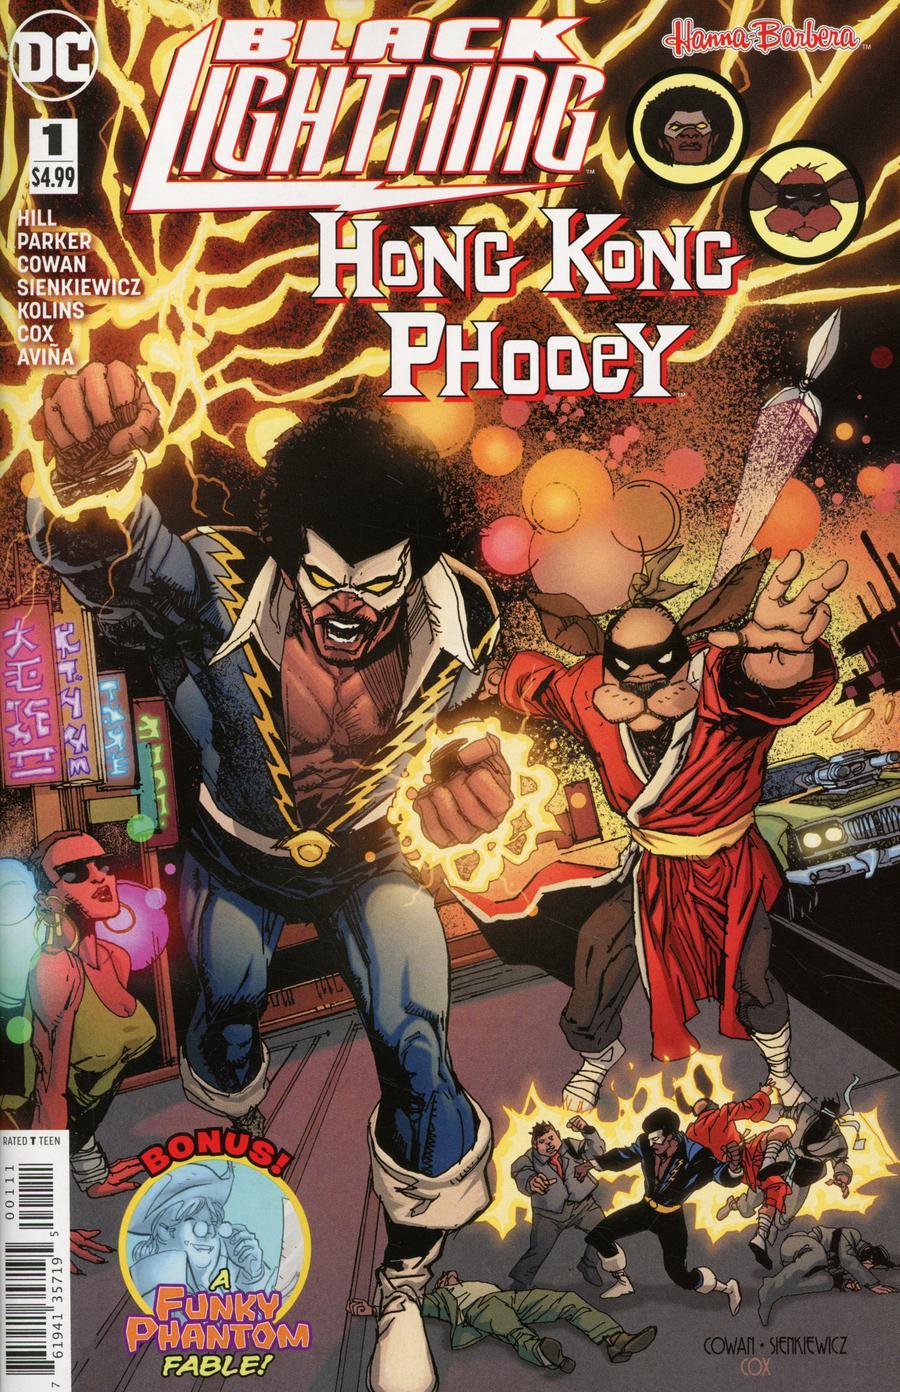 Black Lightning Hong Kong Phooey Special #1 Cover A Regular Denys Cowan & Bill Sienkiewicz Cover